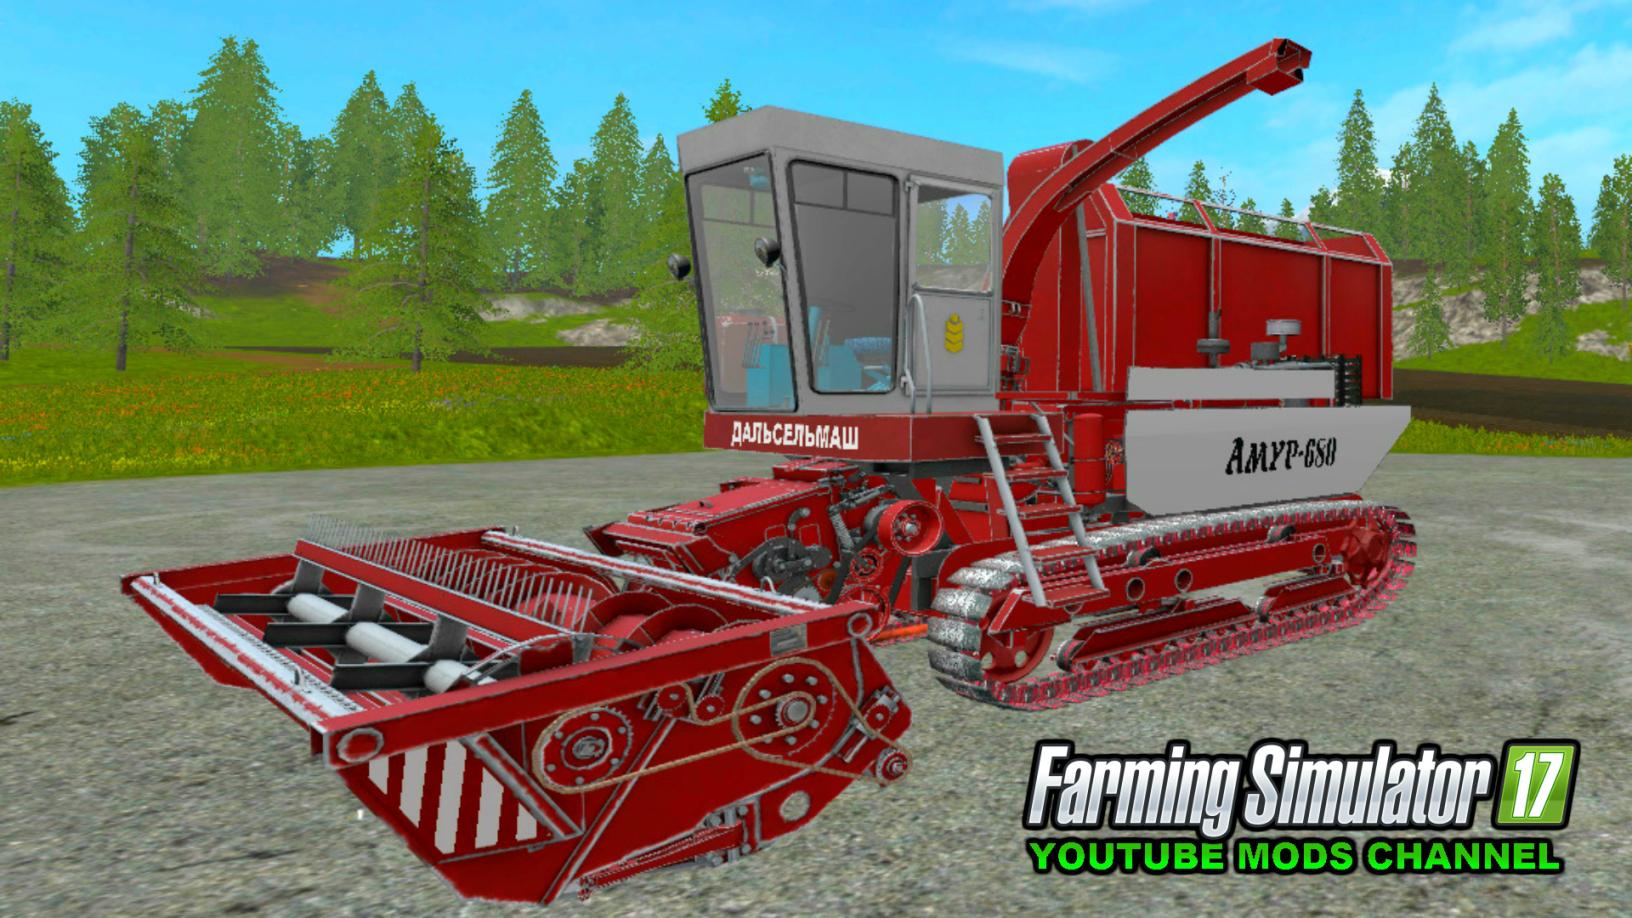 ROSTSELMASH AMUR 680 FS17 - Farming simulator 17 / 2017 mod